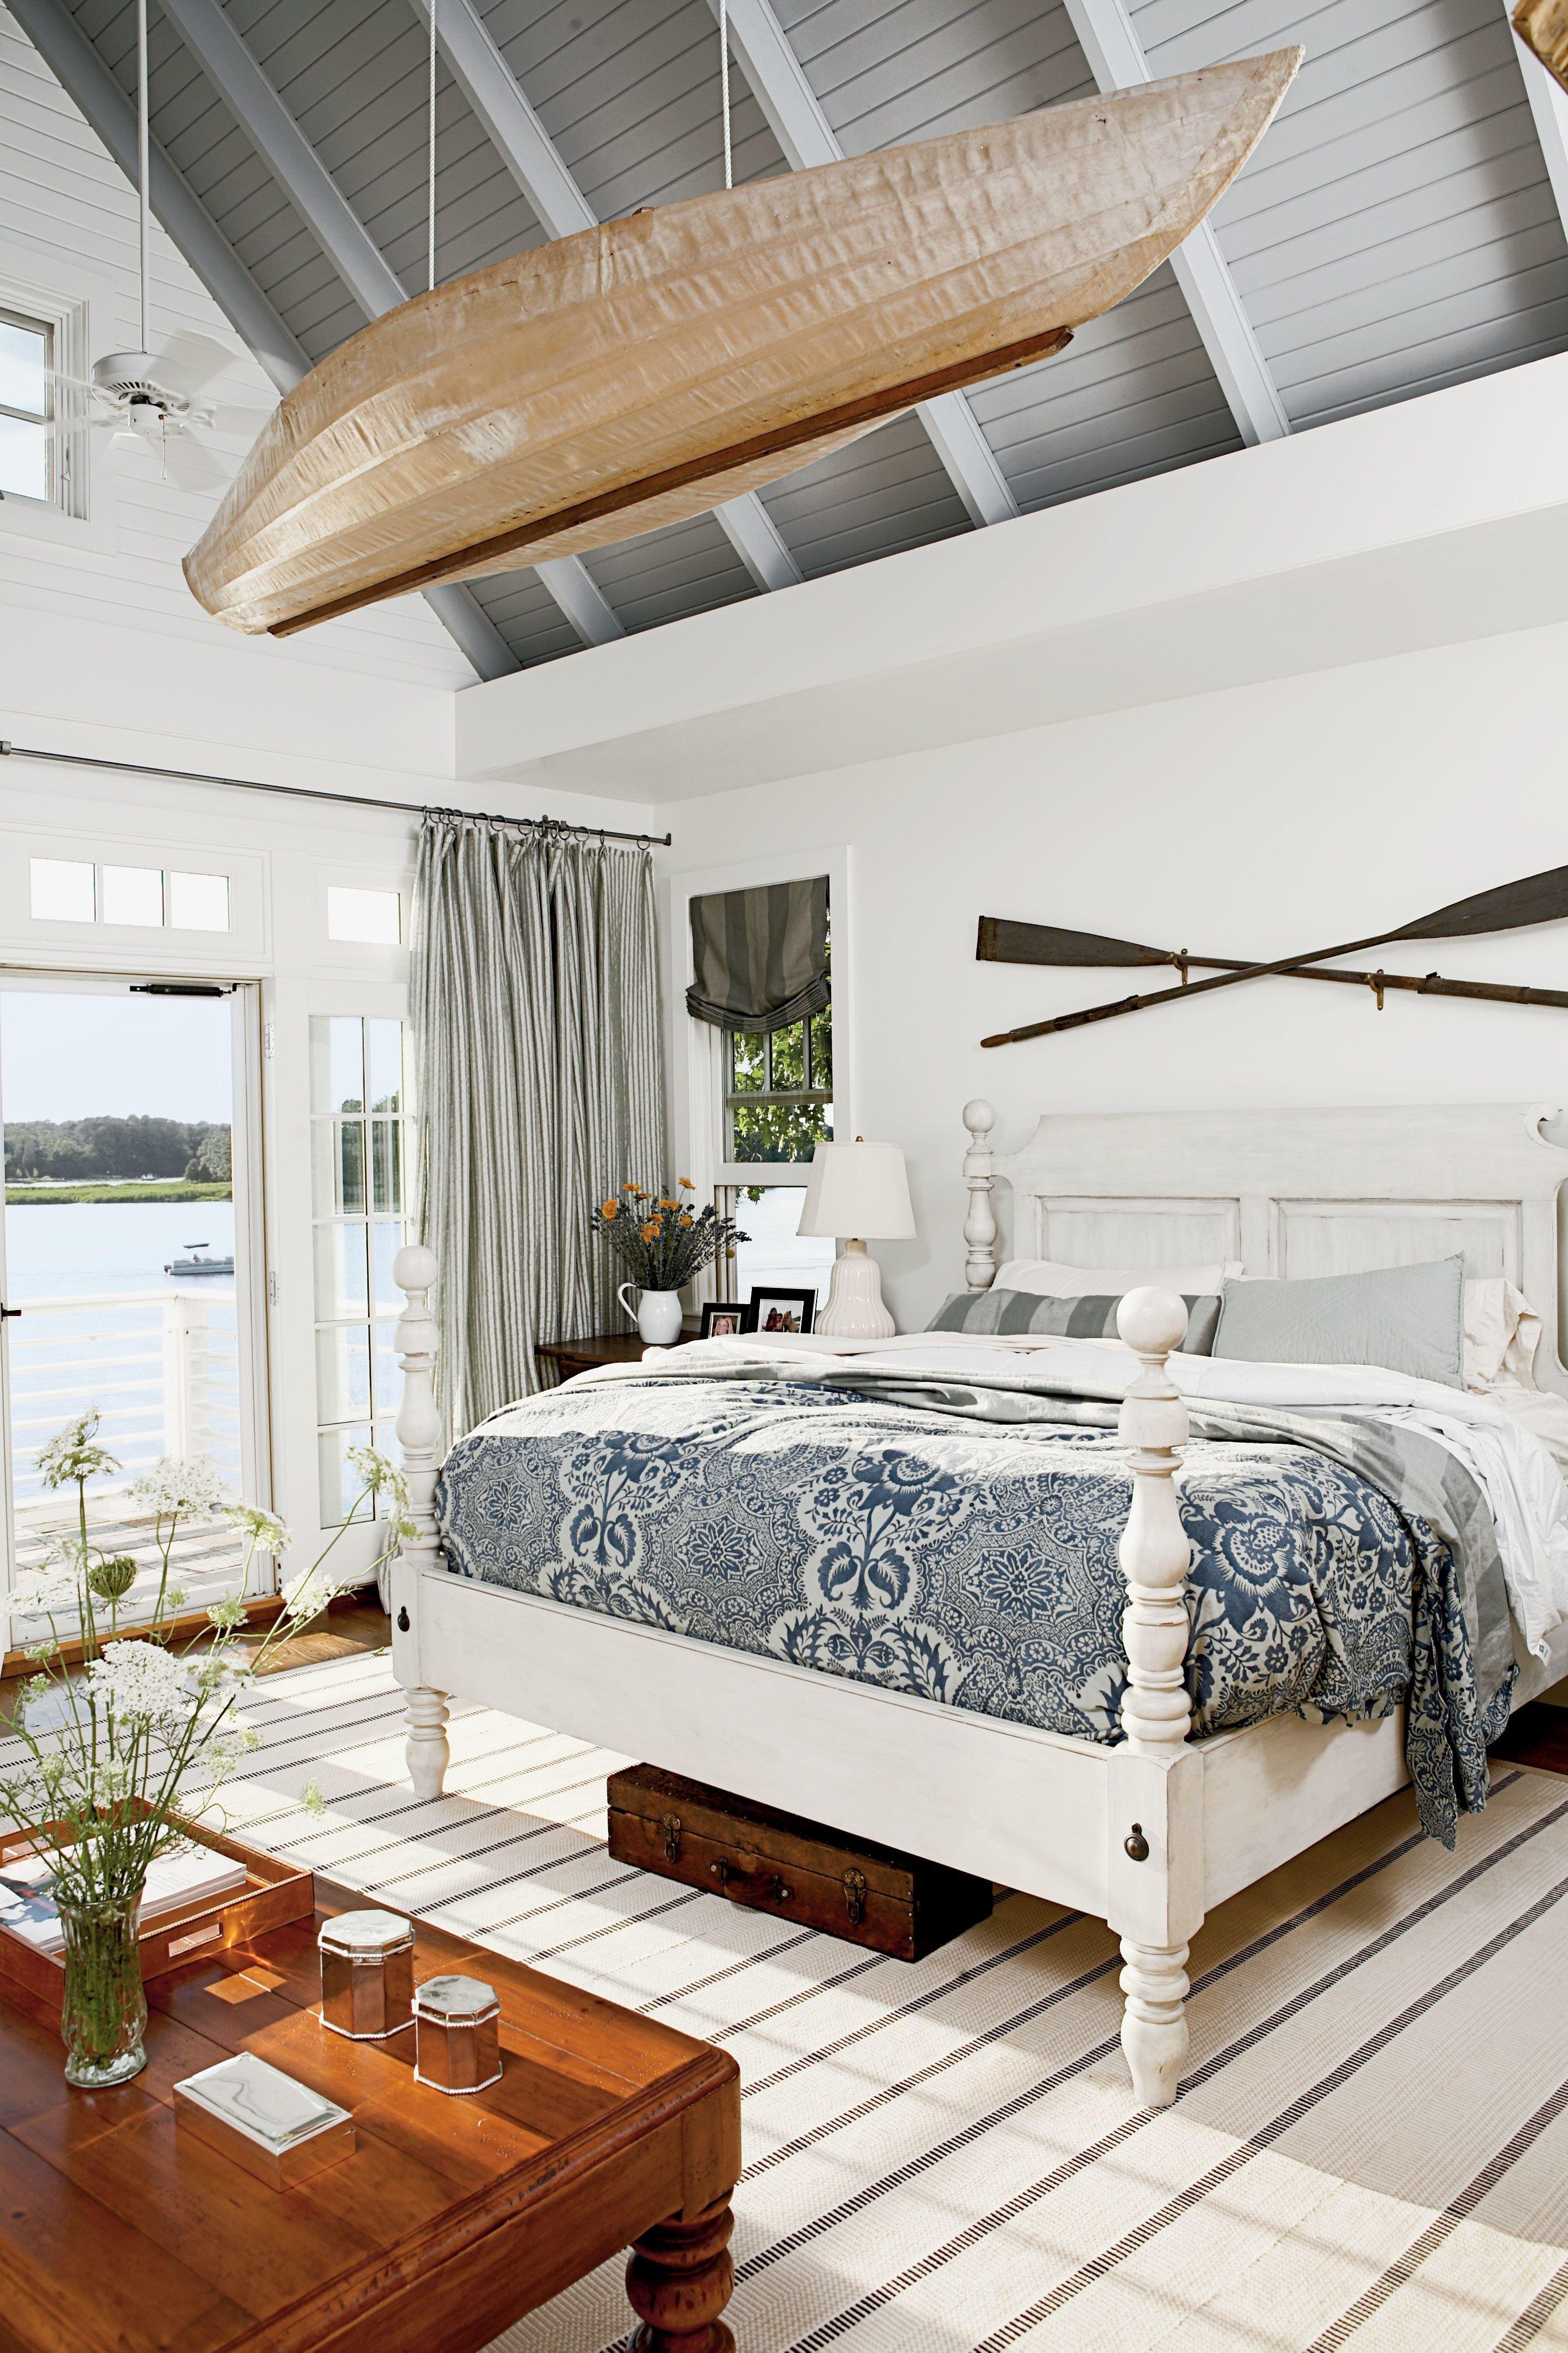 Beach theme Bedroom Decor Fresh 20 Genius Nautical Decorating Ideas